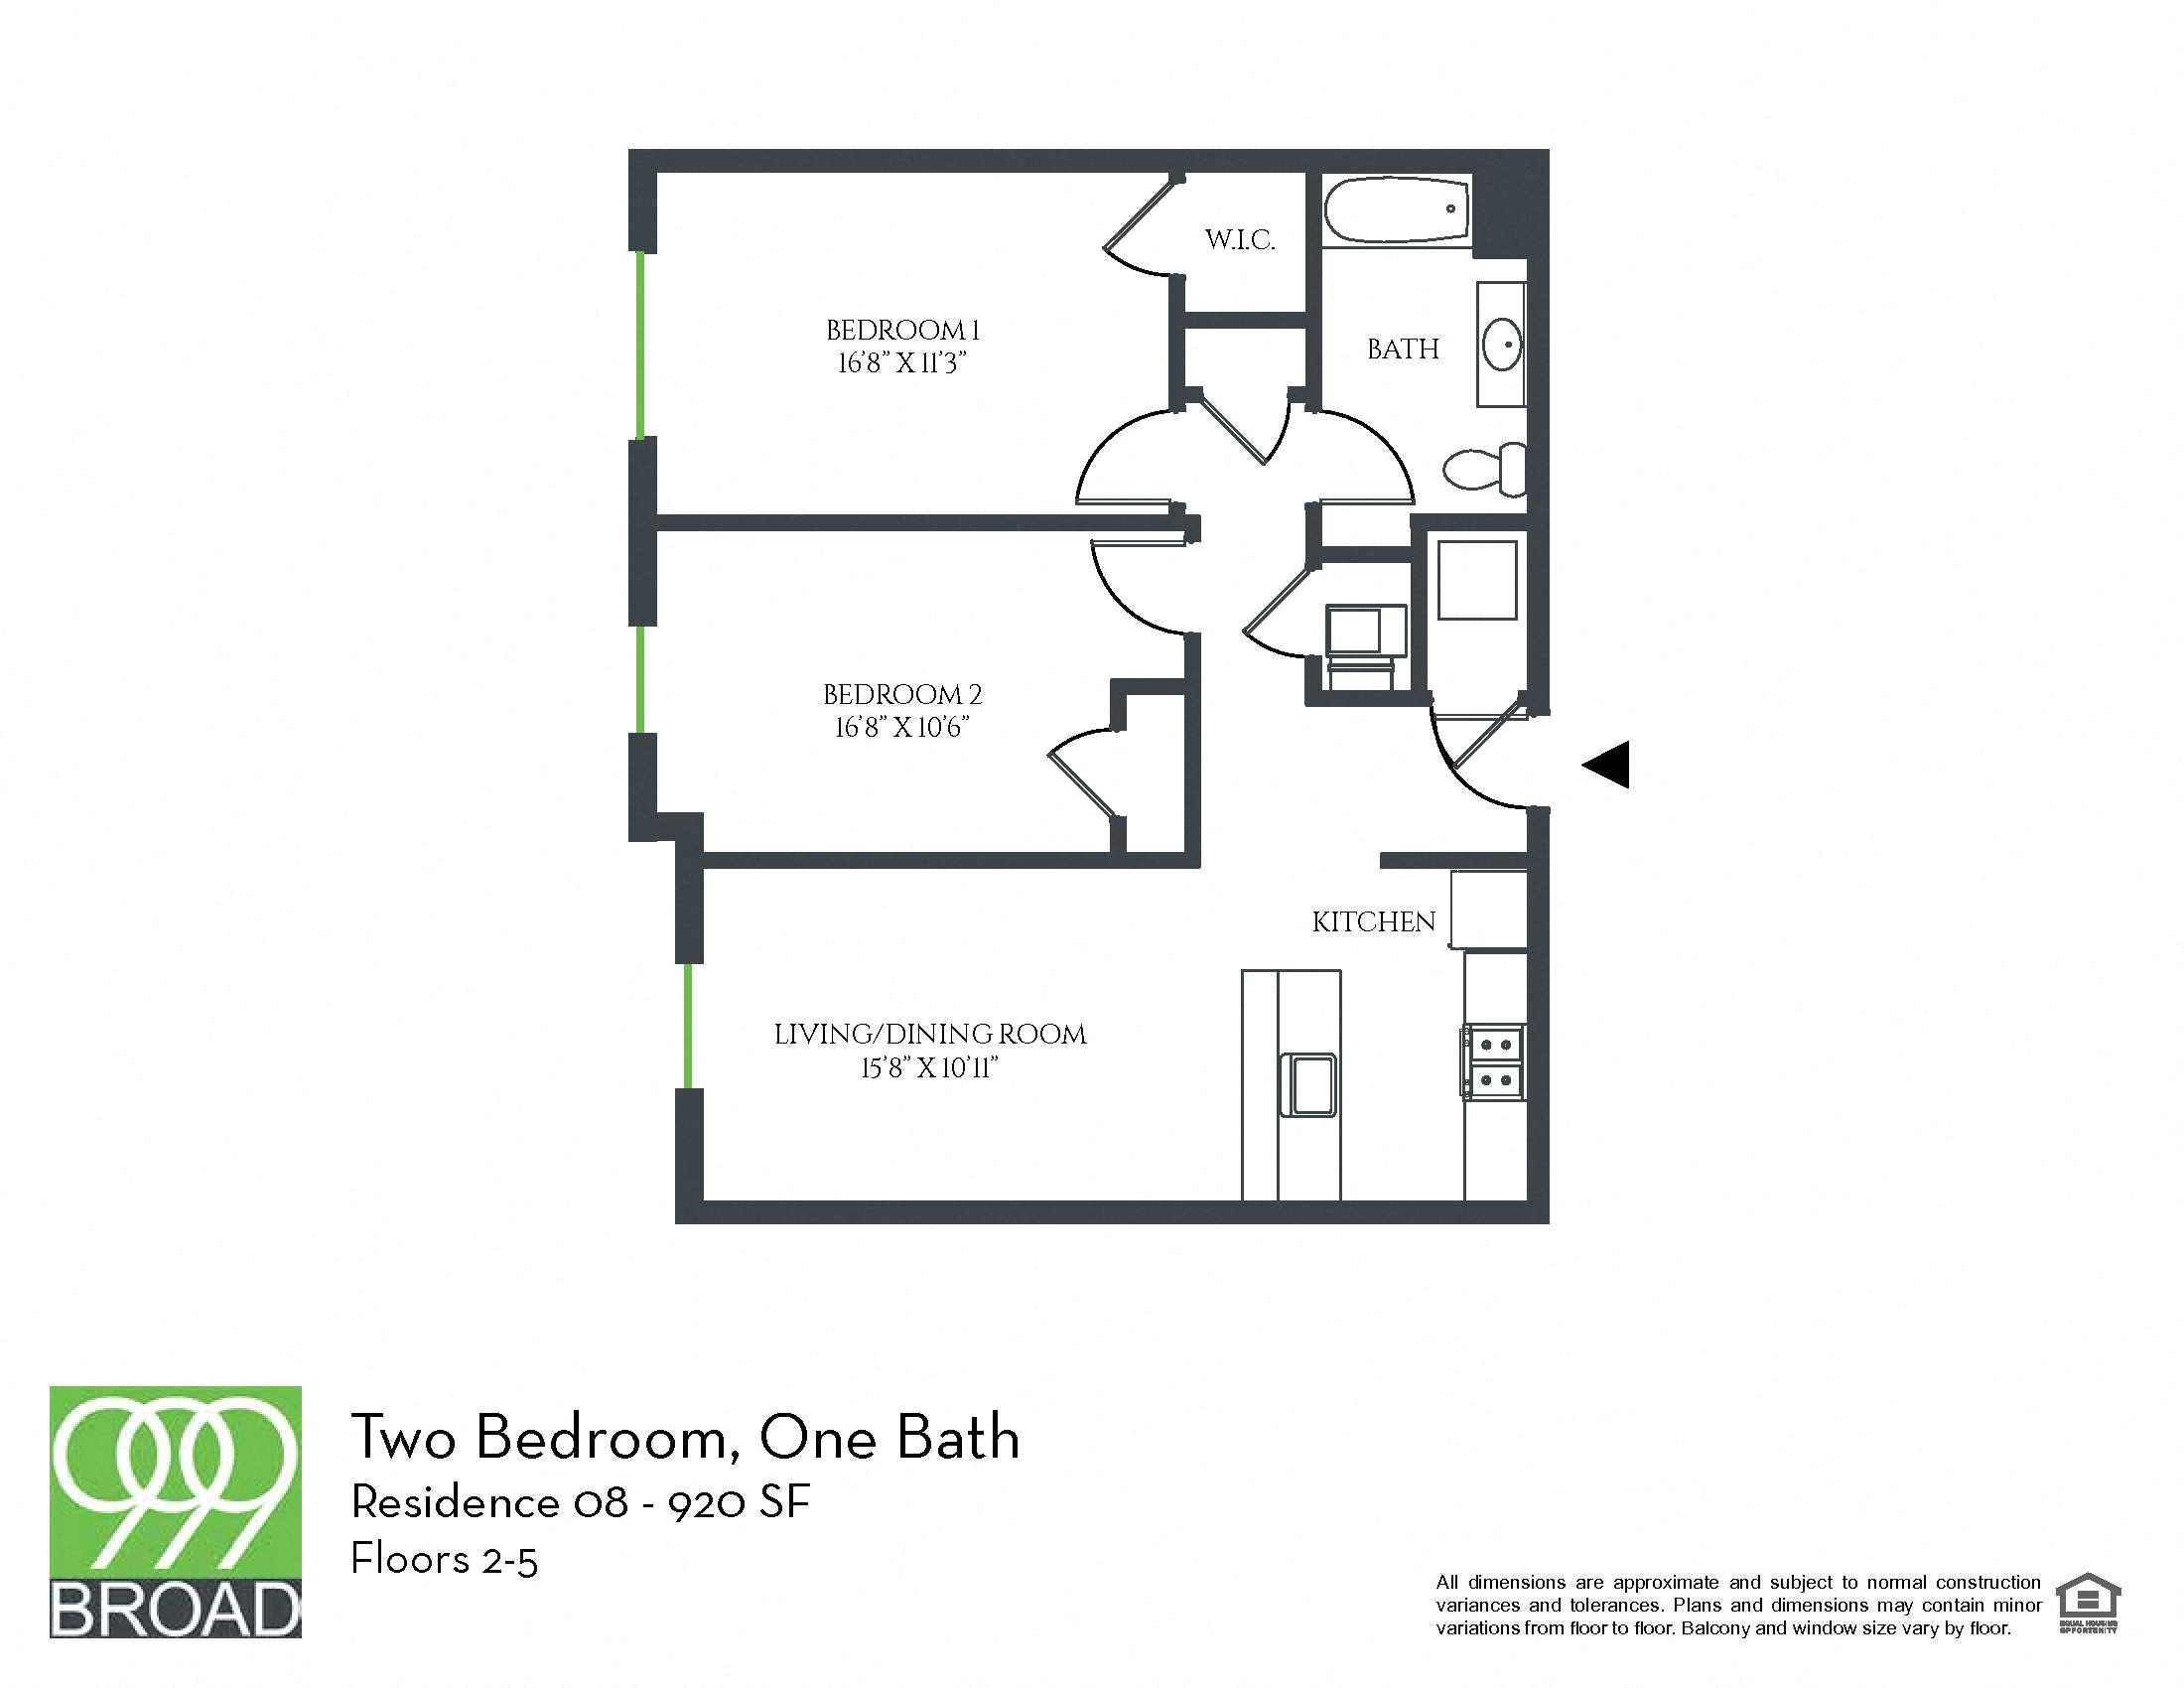 3 Bedroom Apartments For Rent In Newark Nj